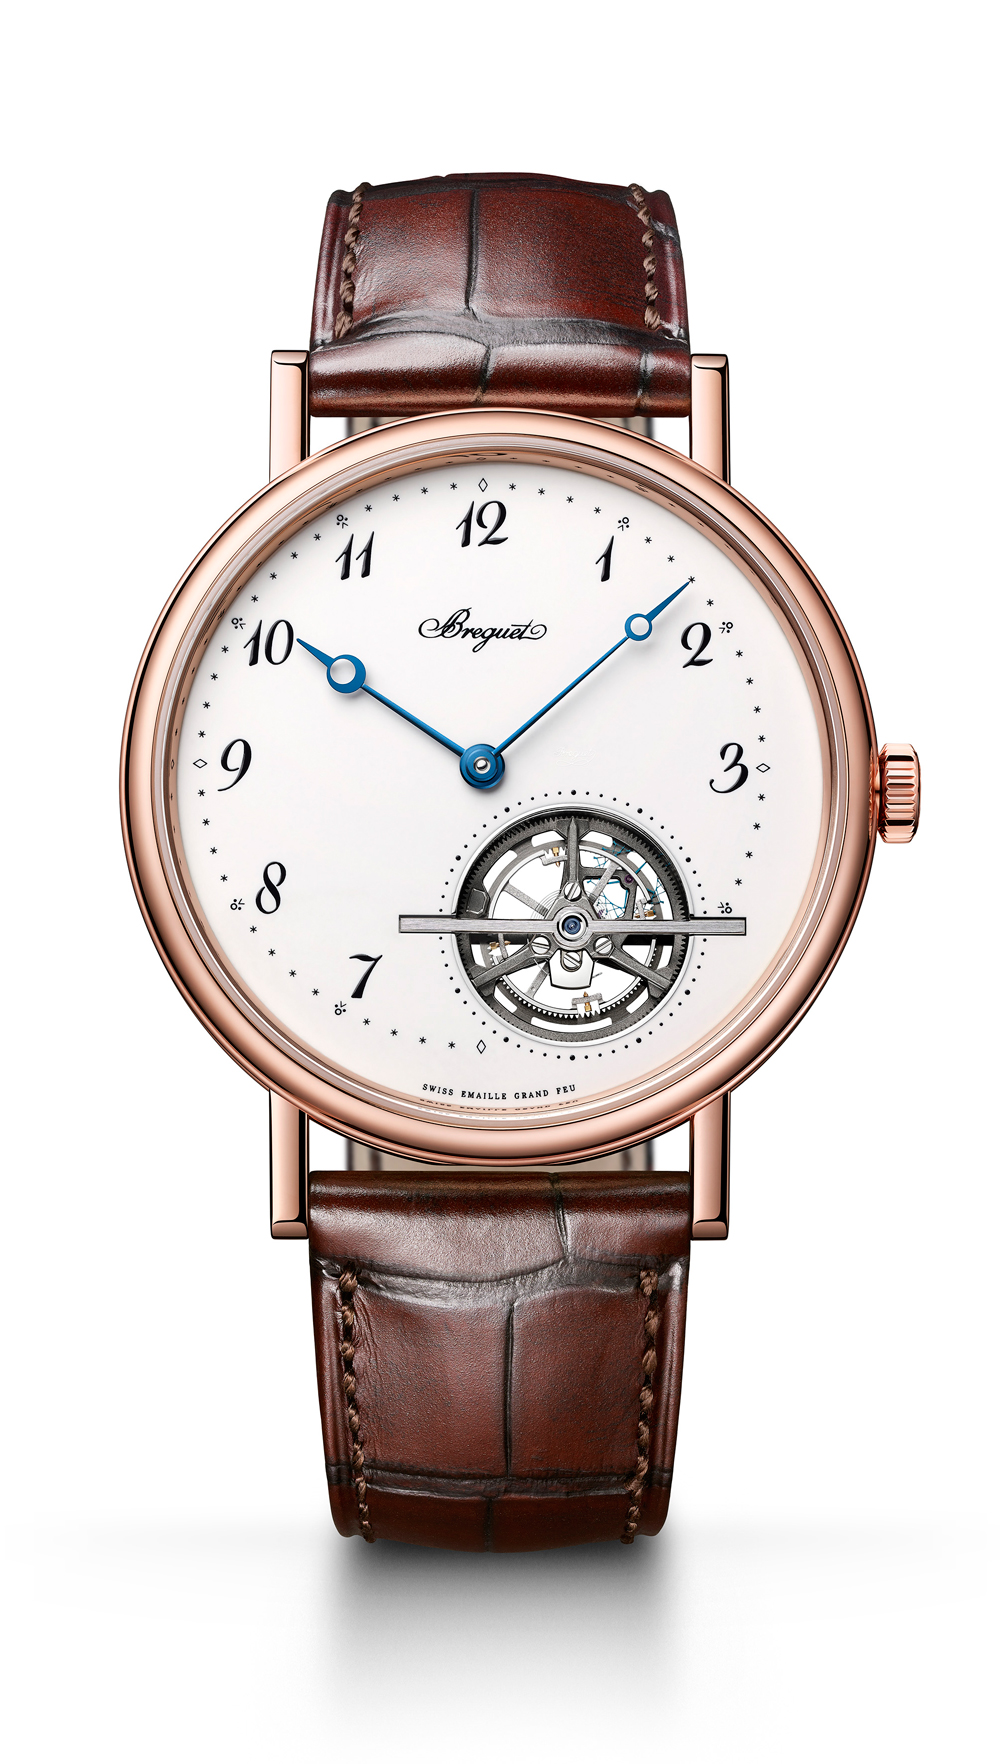 BREGUET宝玑 航海系列的5517钛金属款腕表